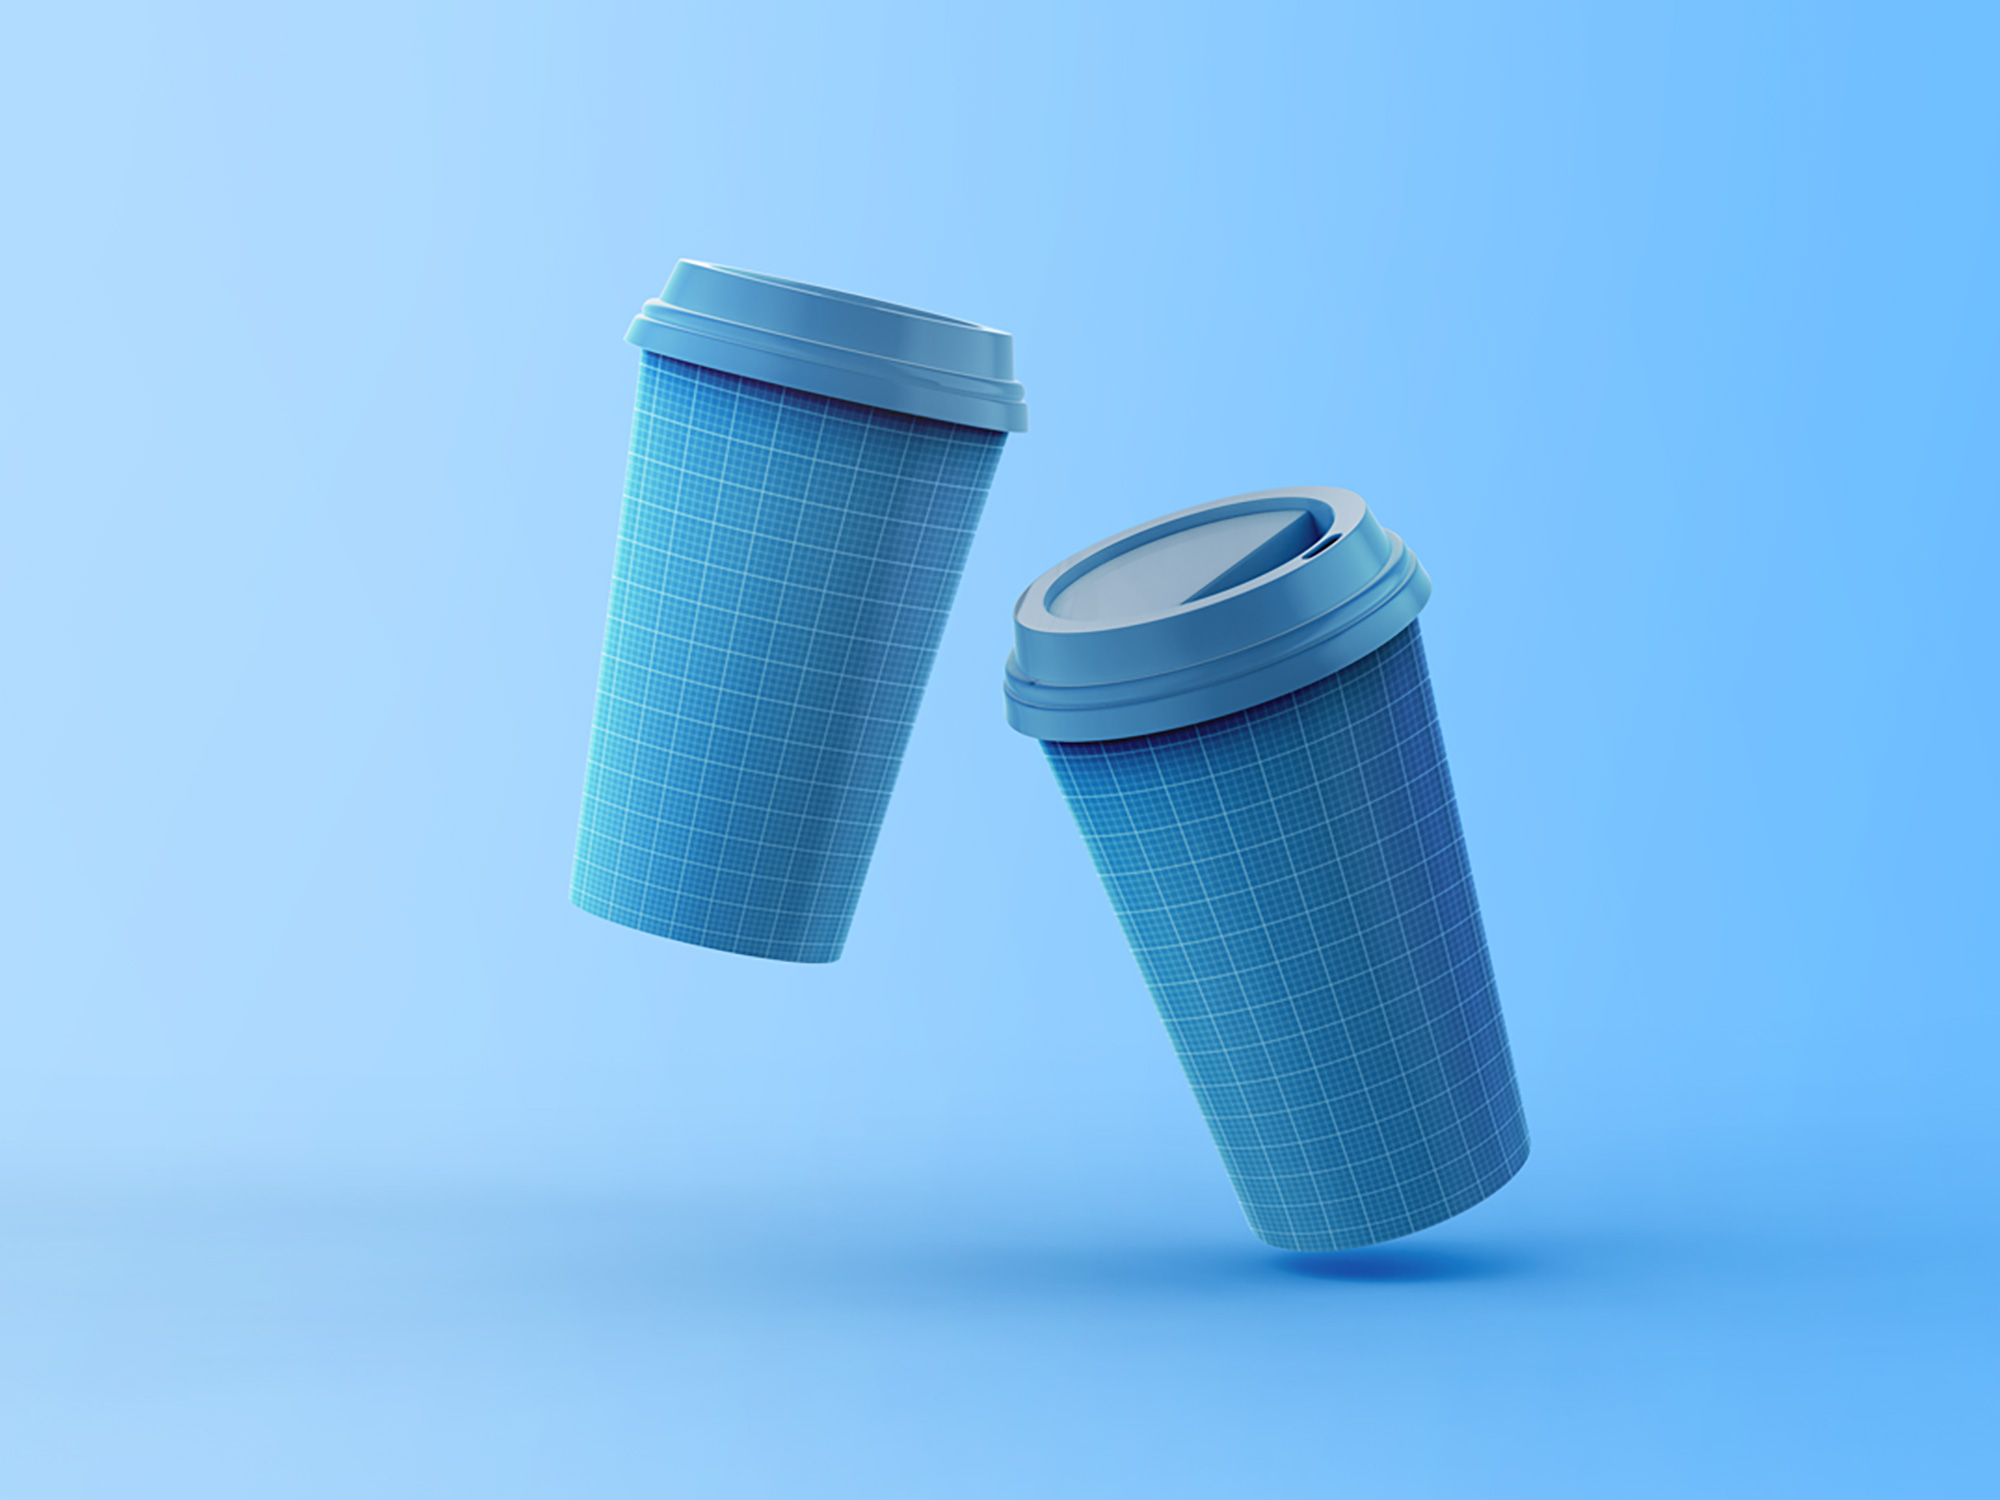 2 Floating Coffee Cups Mockup 3